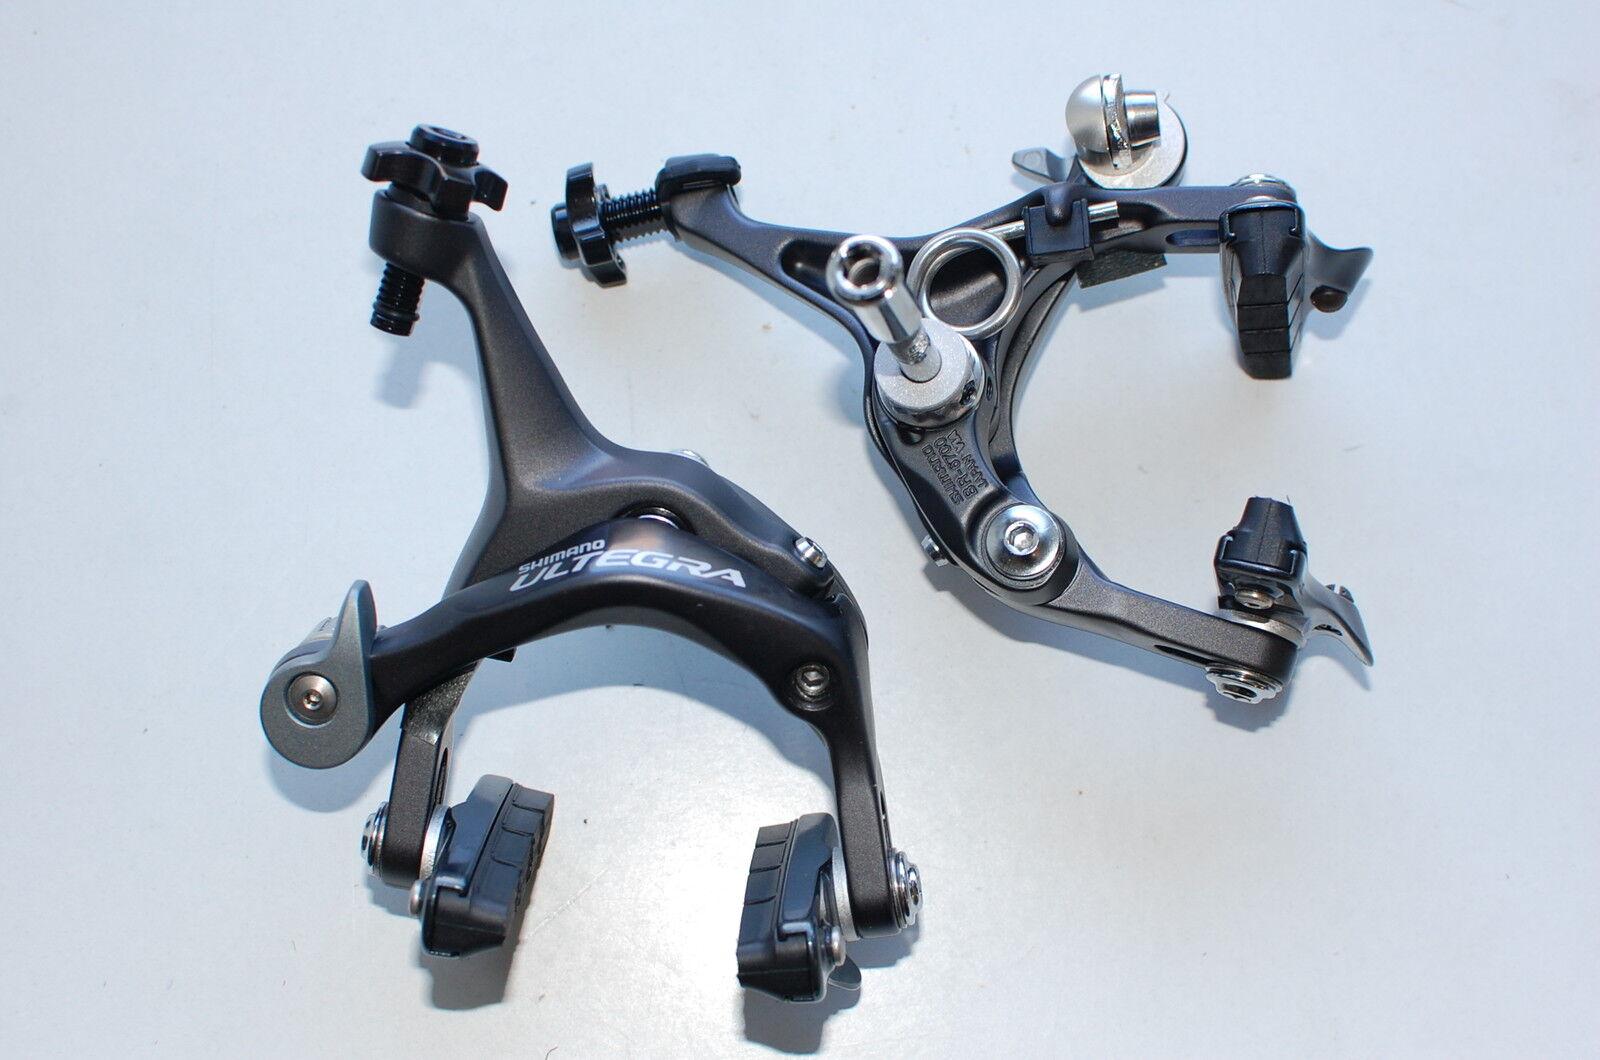 Shimano Ultegra BR-6700 Bremsensatz glossy grau wie Bild